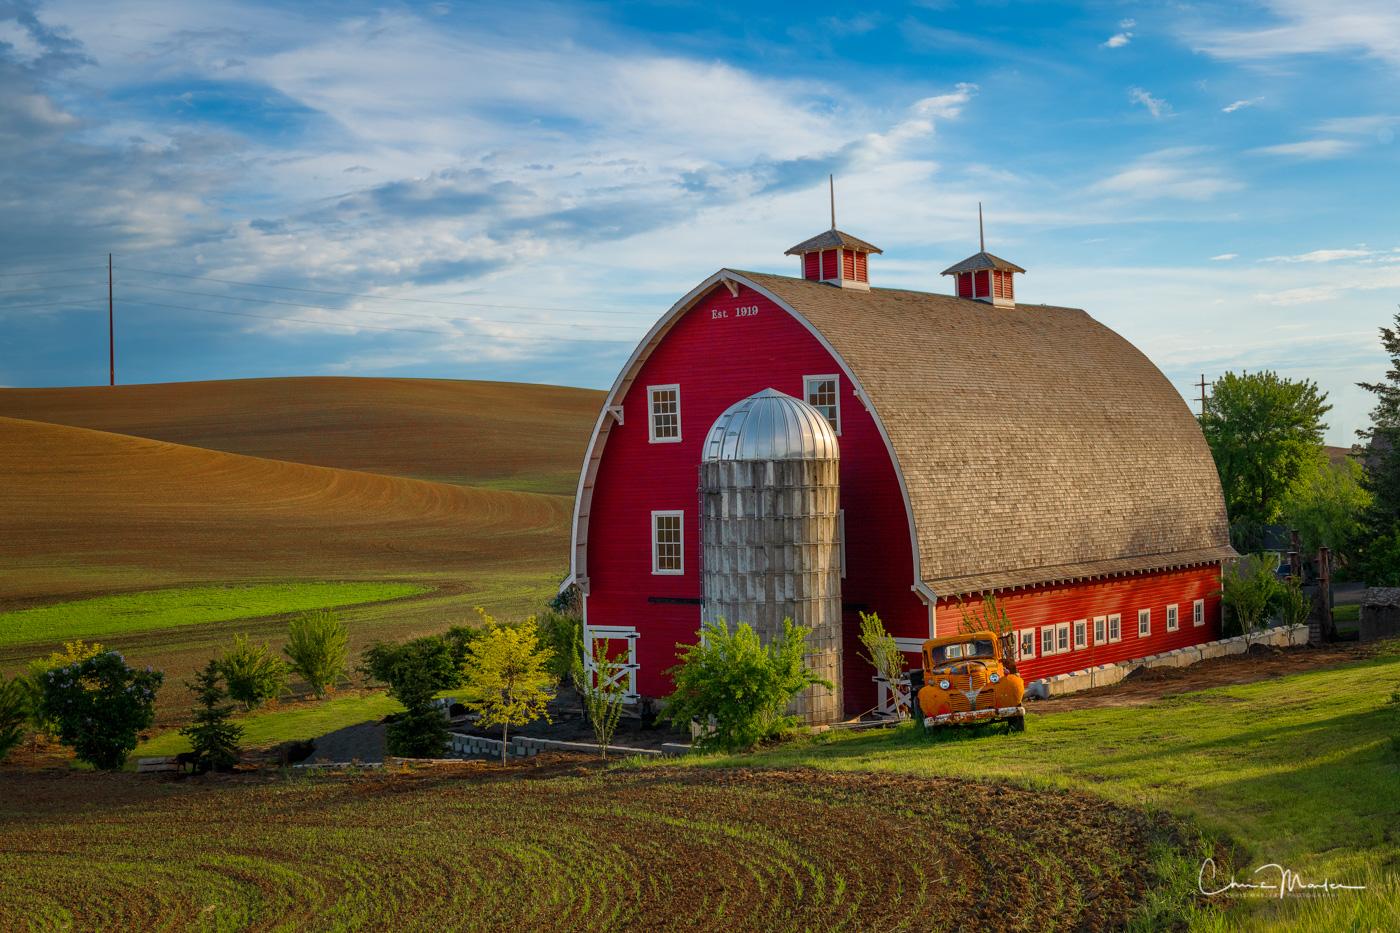 Palouse, Colfax, orange truck, rural, barn, red barn, Heidenreich, rolling hills, photo